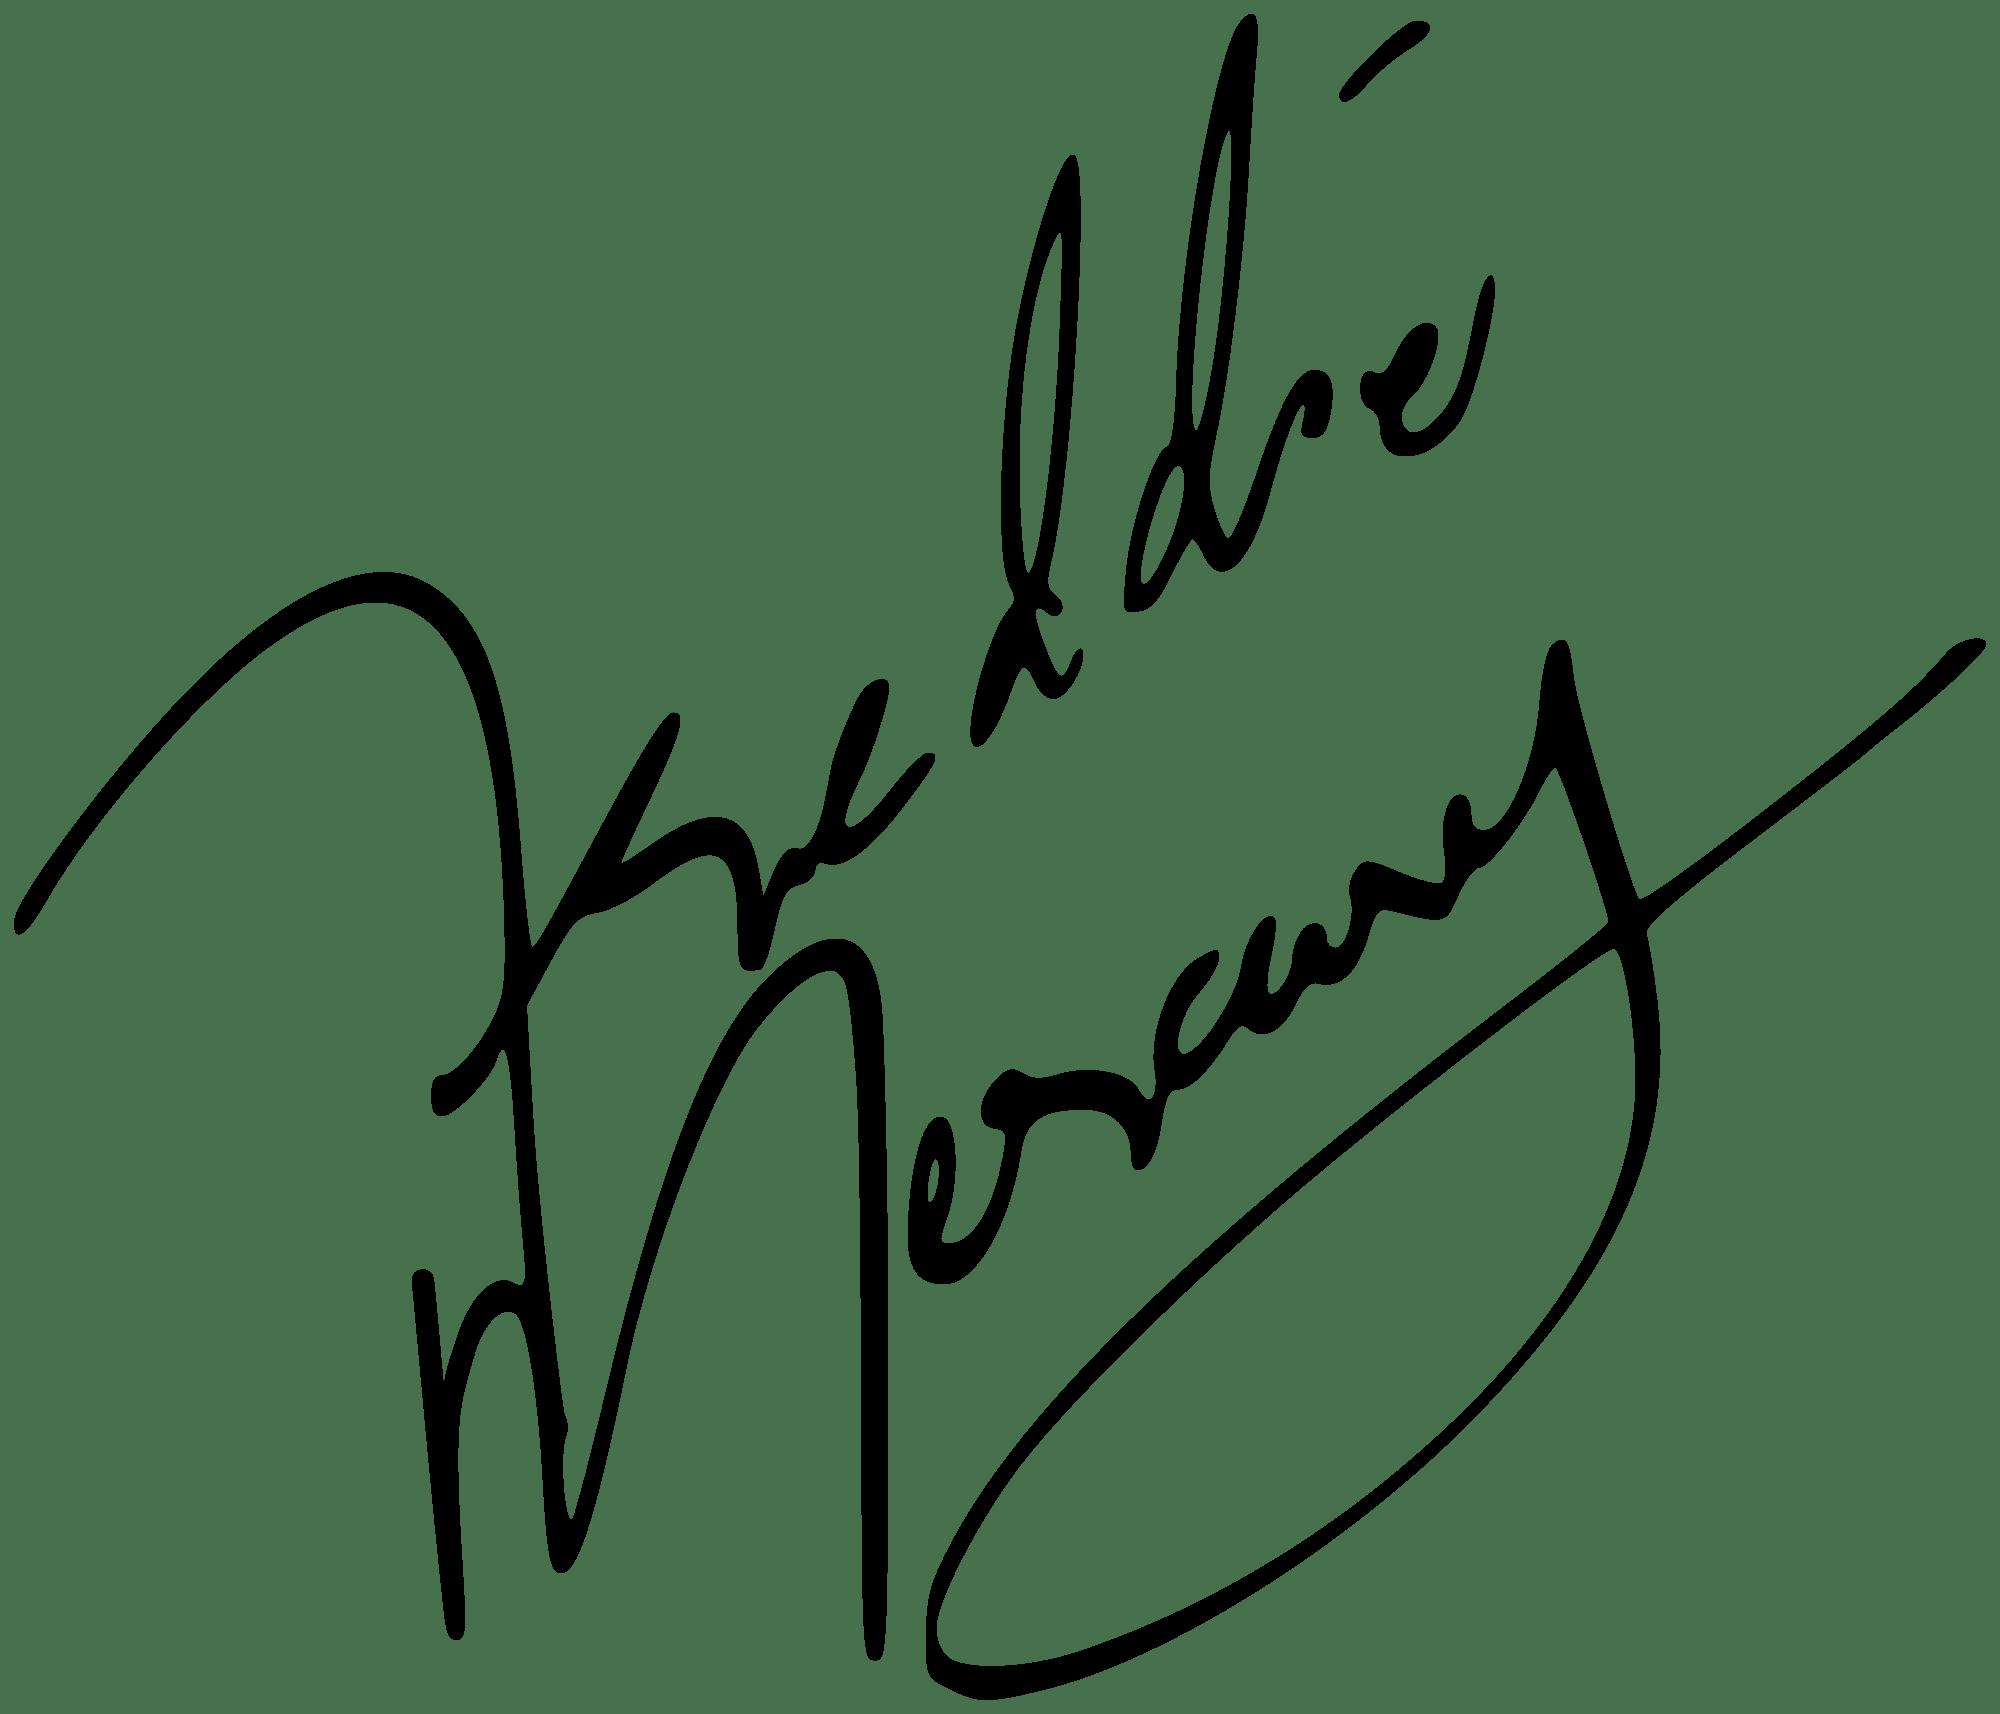 clip transparent library Drawing signature cool. Freddie mercury transparent png